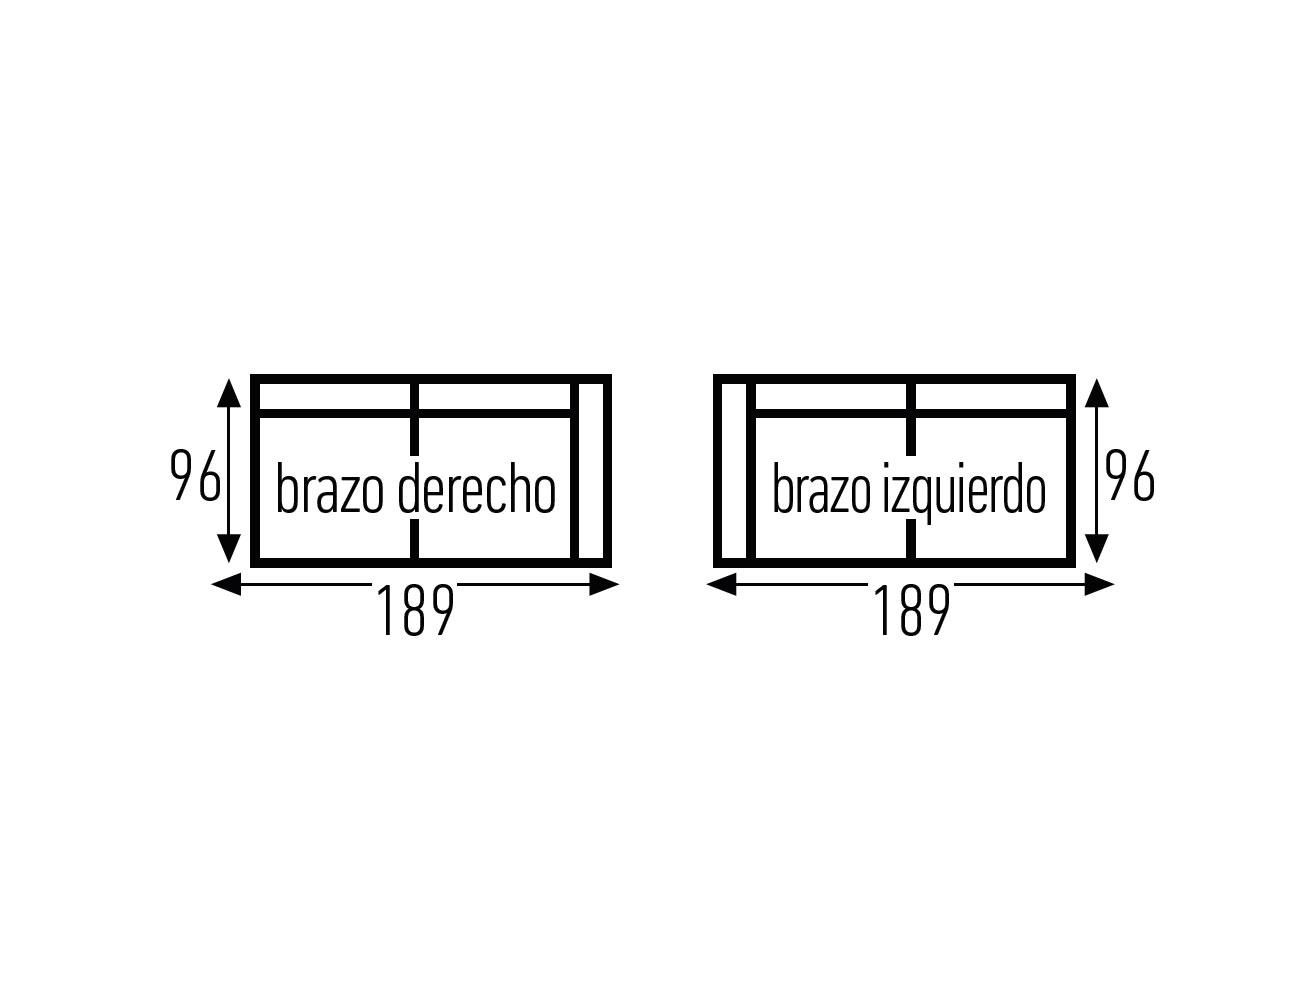 Croquis 3p sin 1 brazo 1895